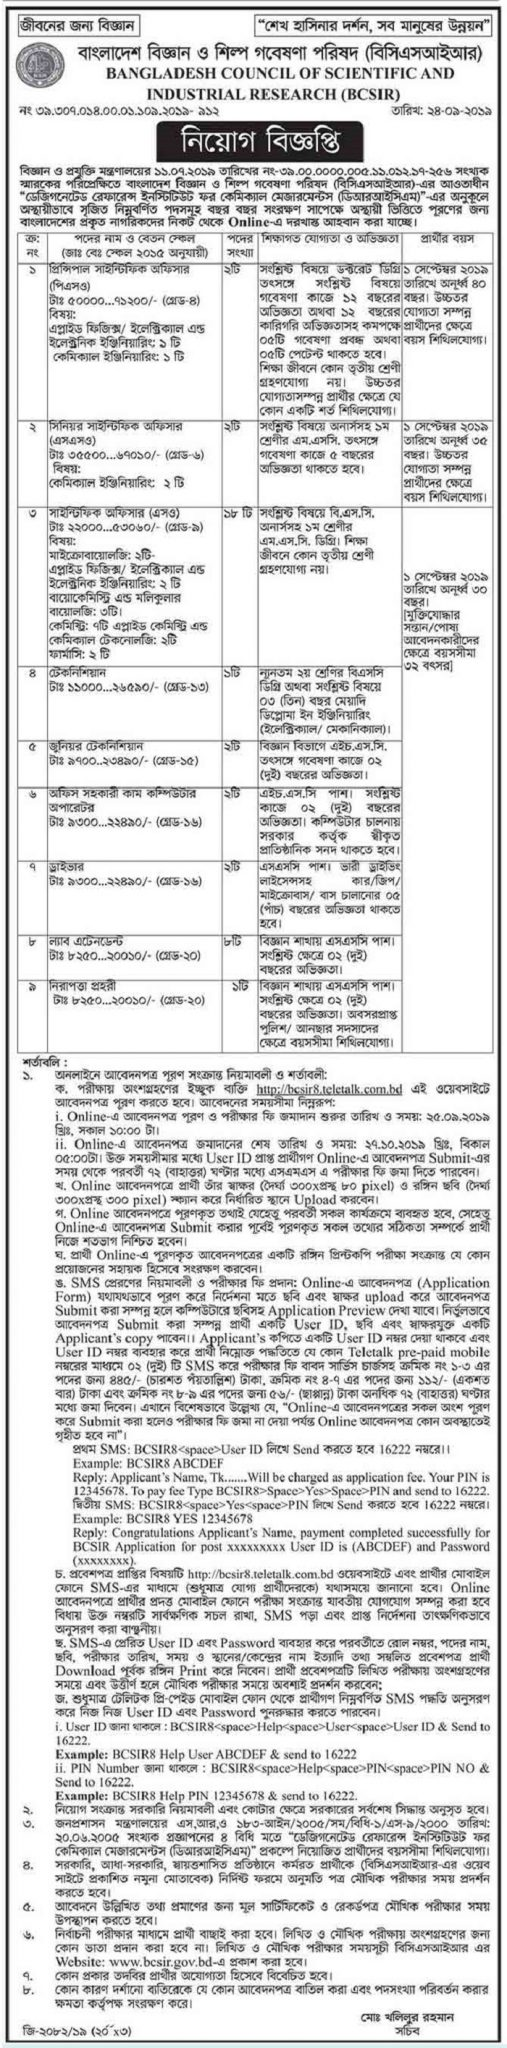 Bangladesh Council of Scientific and Industrial Research Job Circular 2019